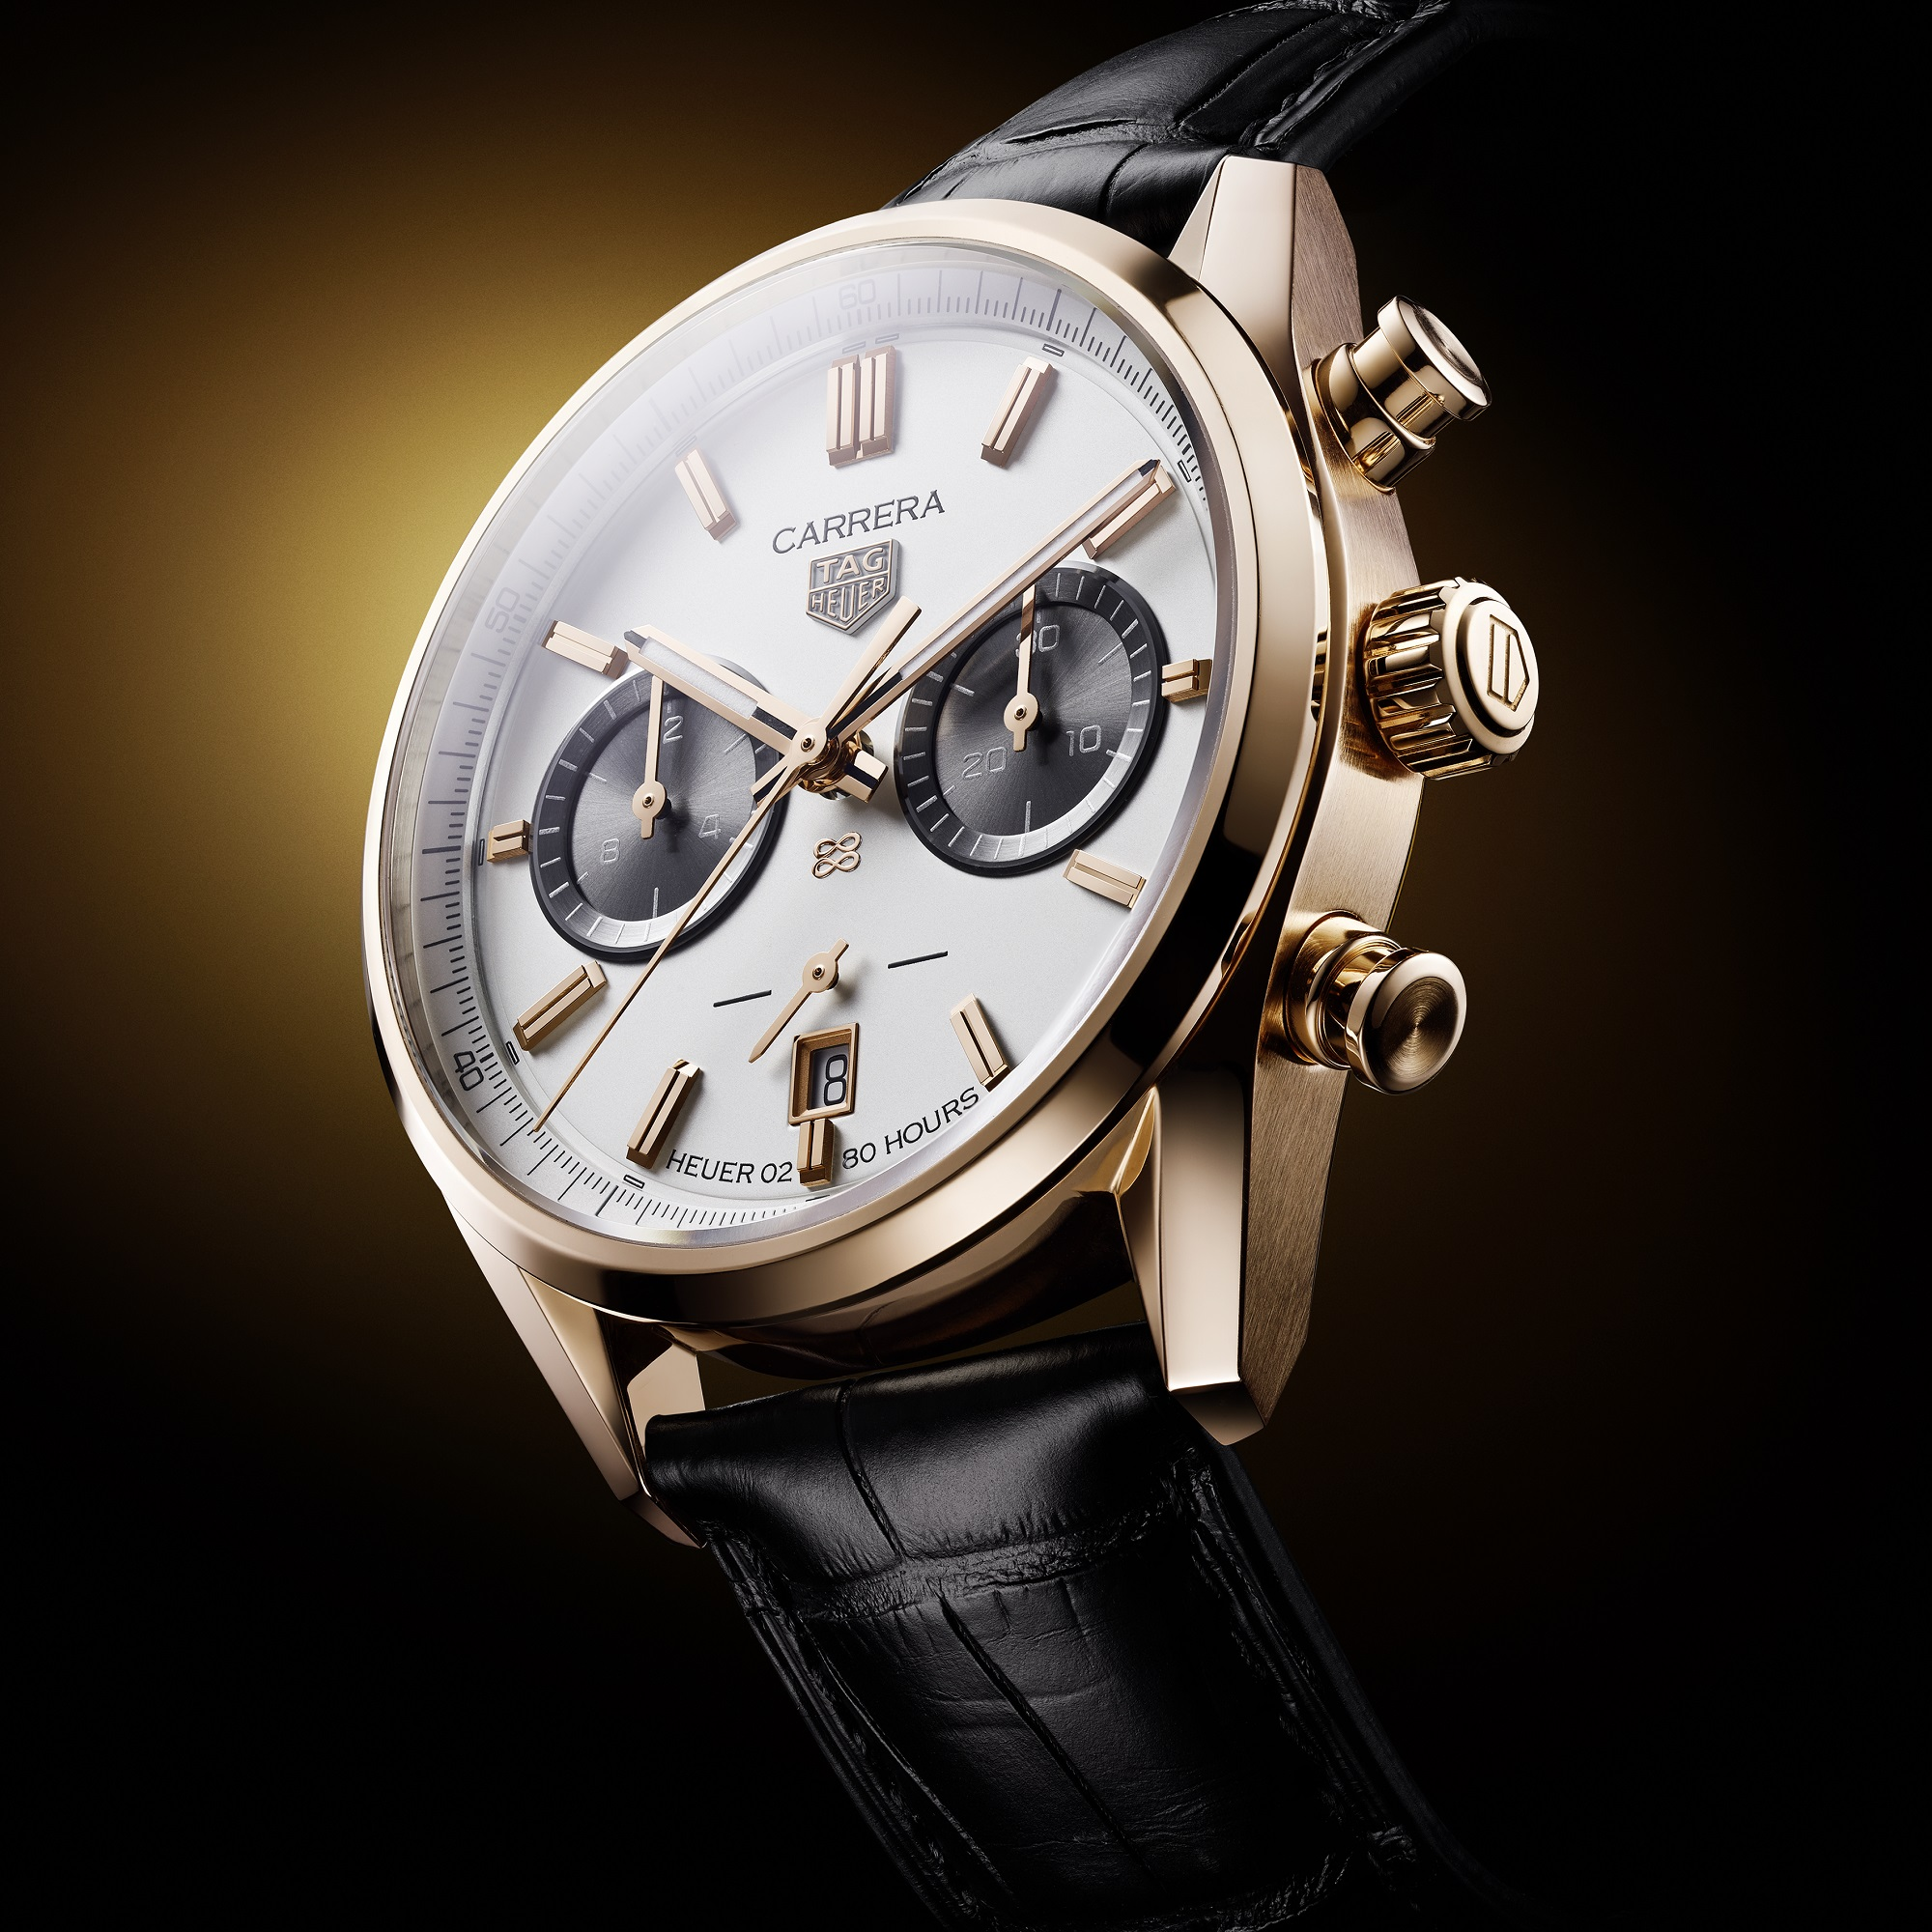 TAG Heuer Carrera Chronograph Gold Jack Heuer's Birthday watch